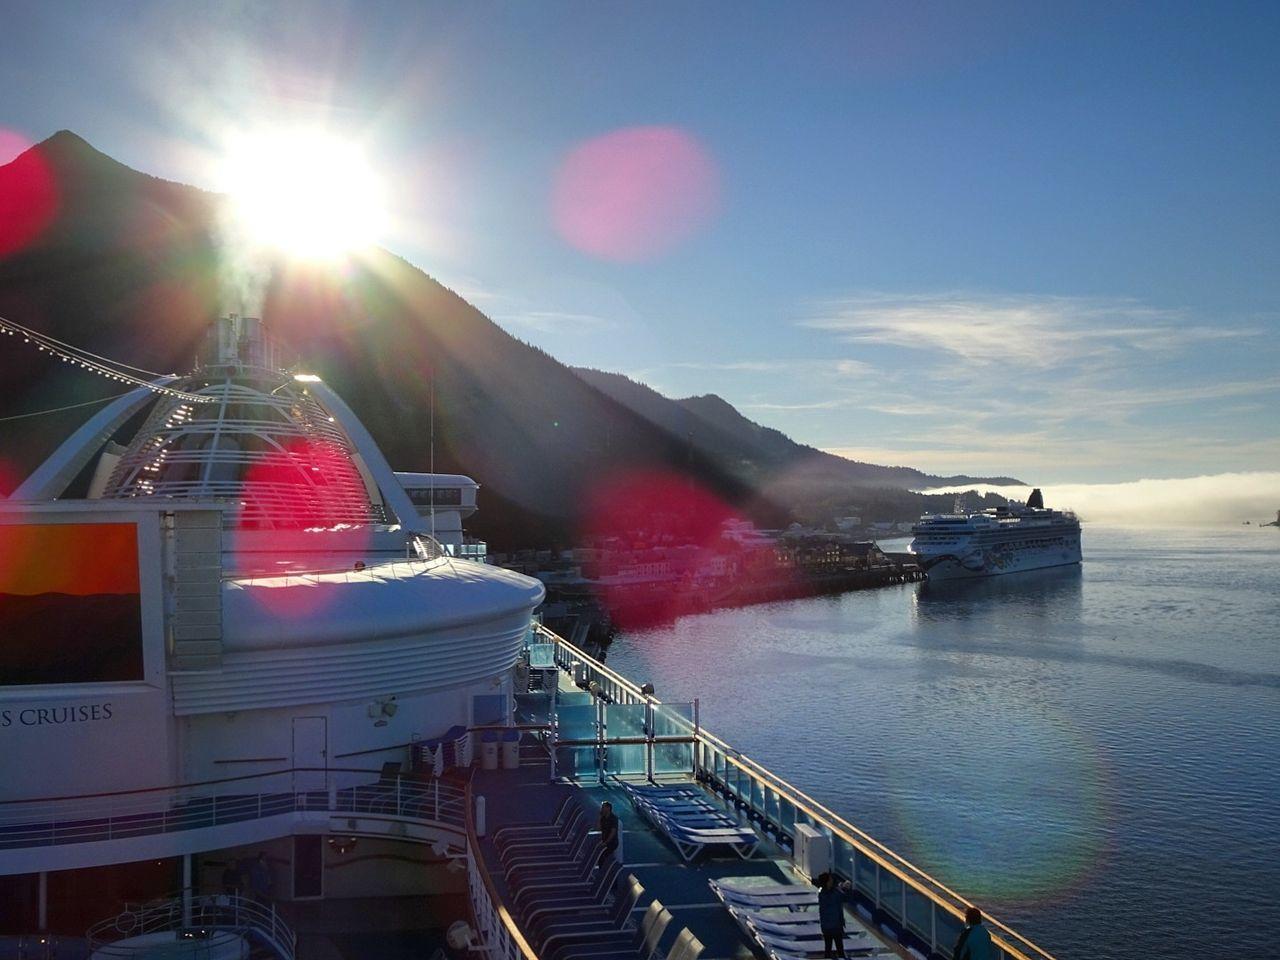 Finding New Frontiers Ketchikan Alaska Cruise Ship Mountains Shiny Lightleaks Nature Manvsnature